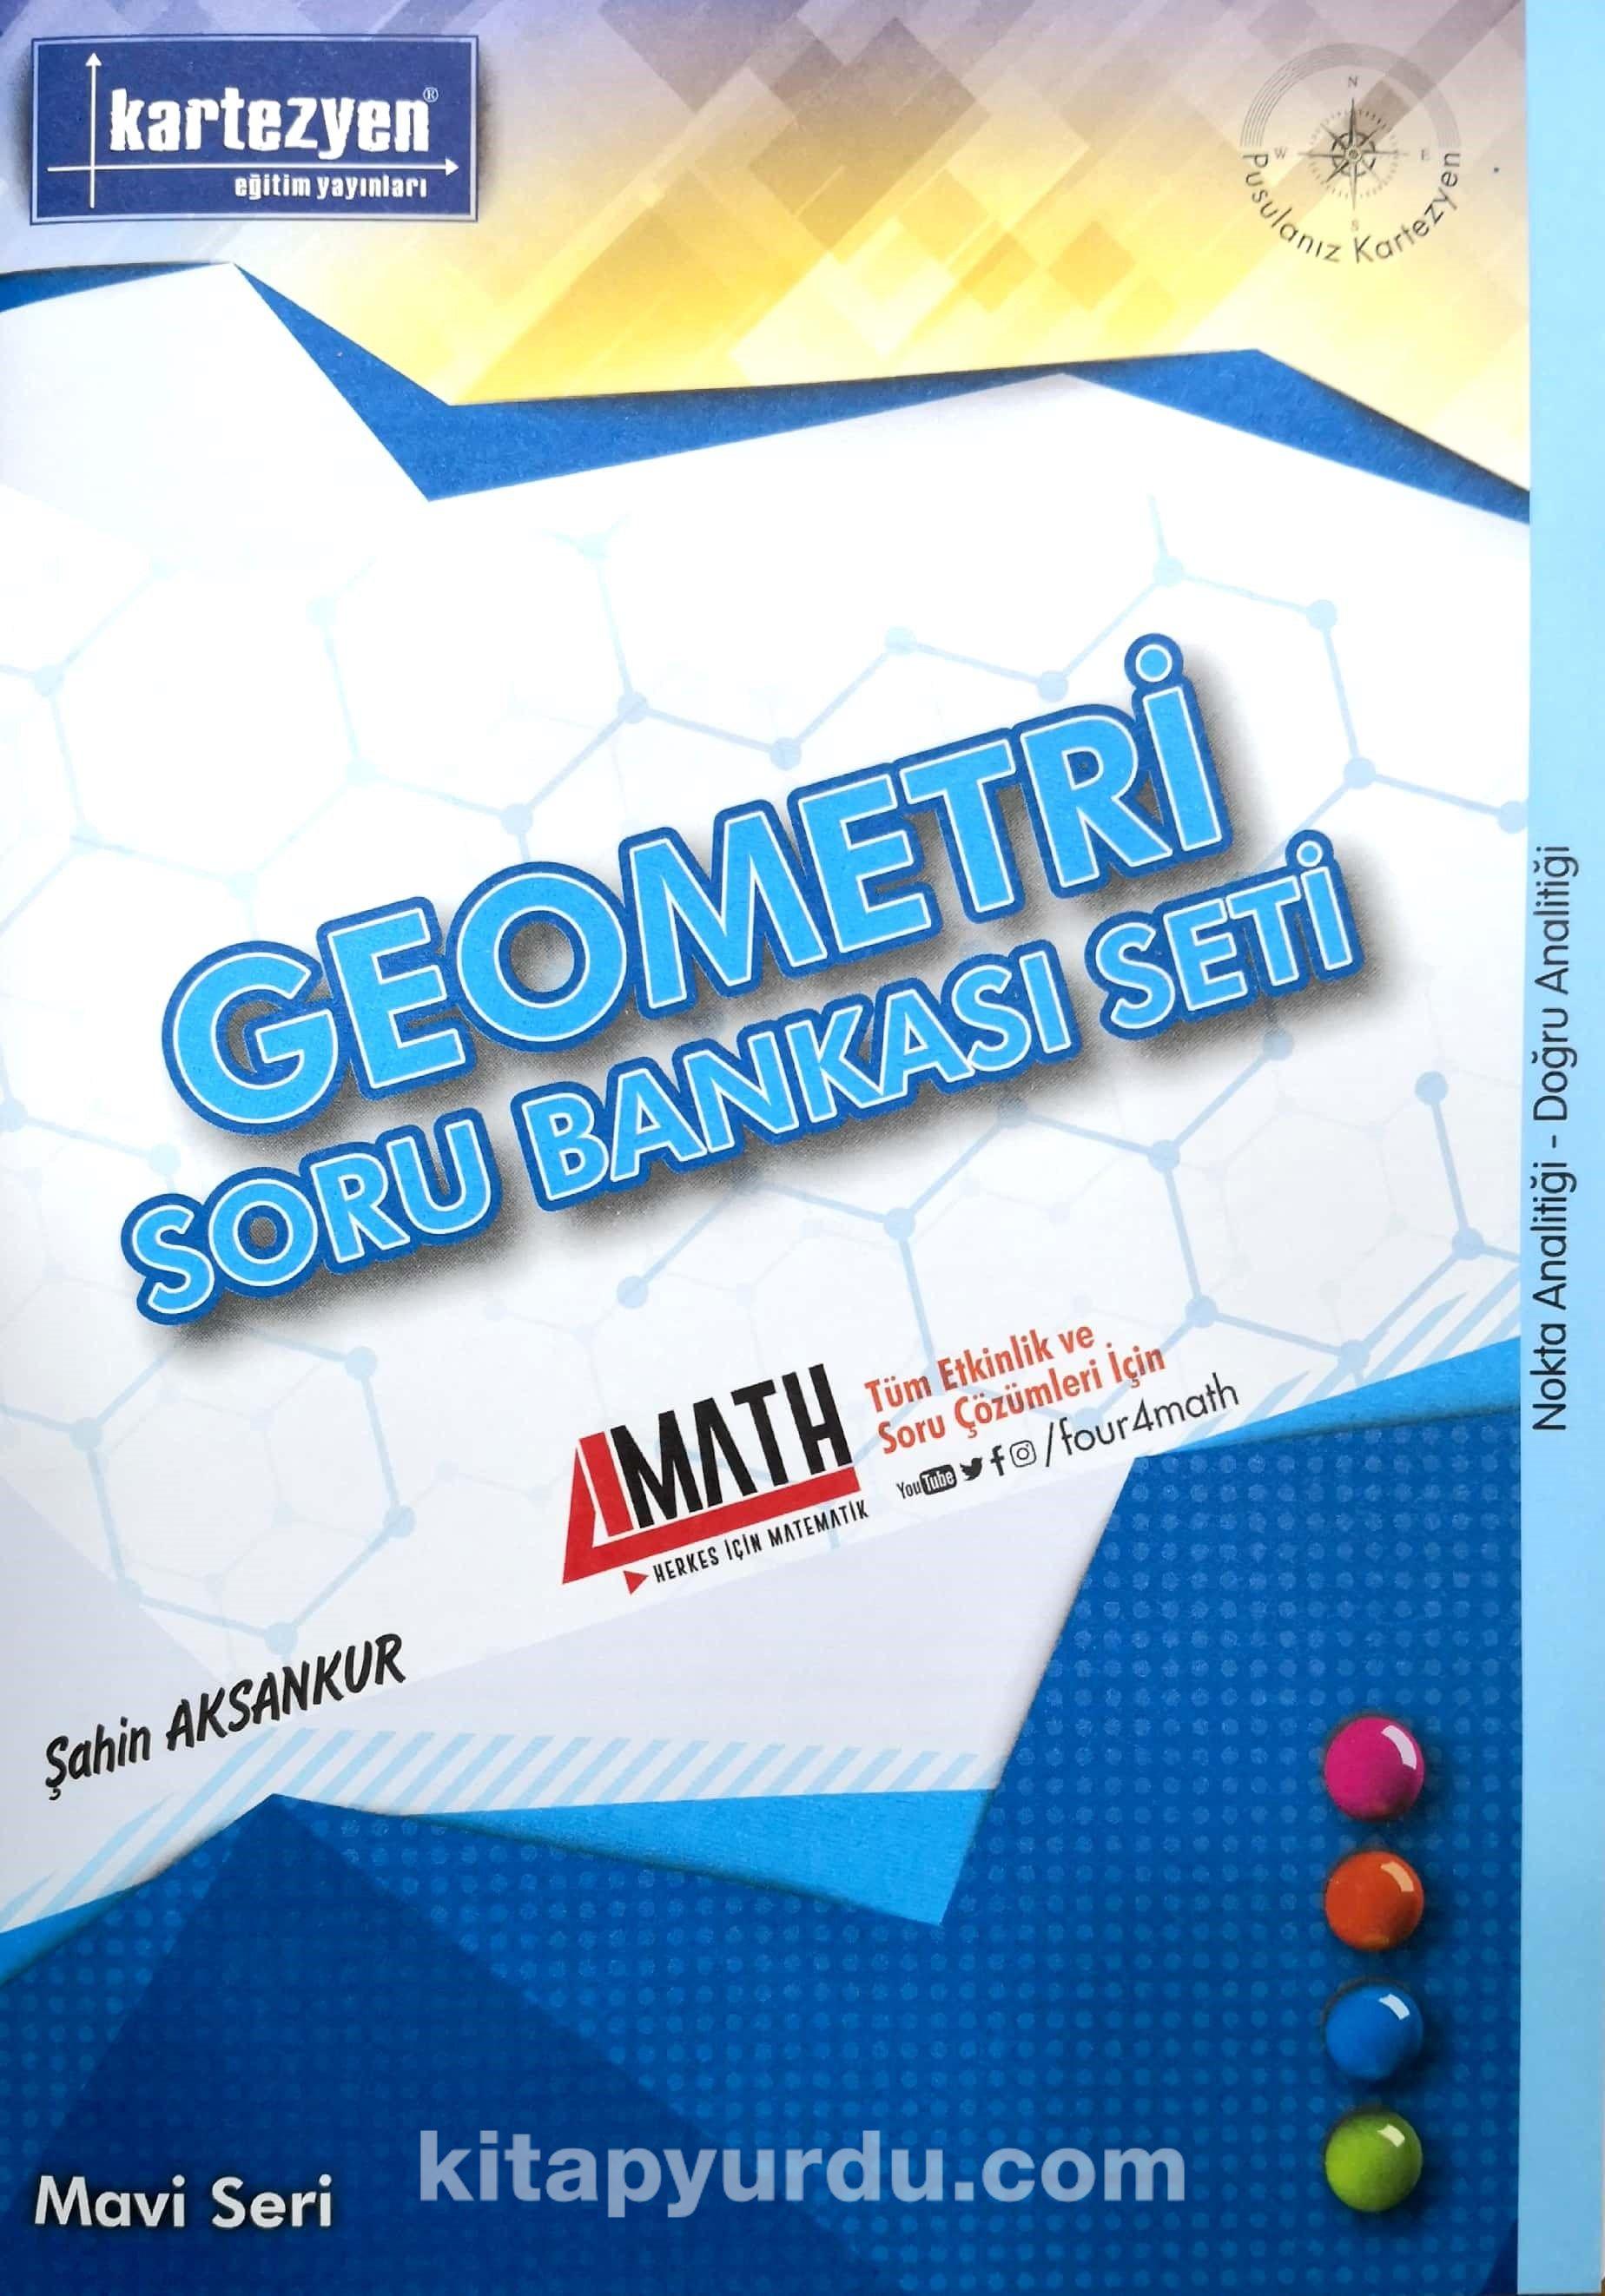 Nokta Analitiği, Doğru Analitiği / Geometri Soru Bankası Seti - Şahin Aksankur pdf epub